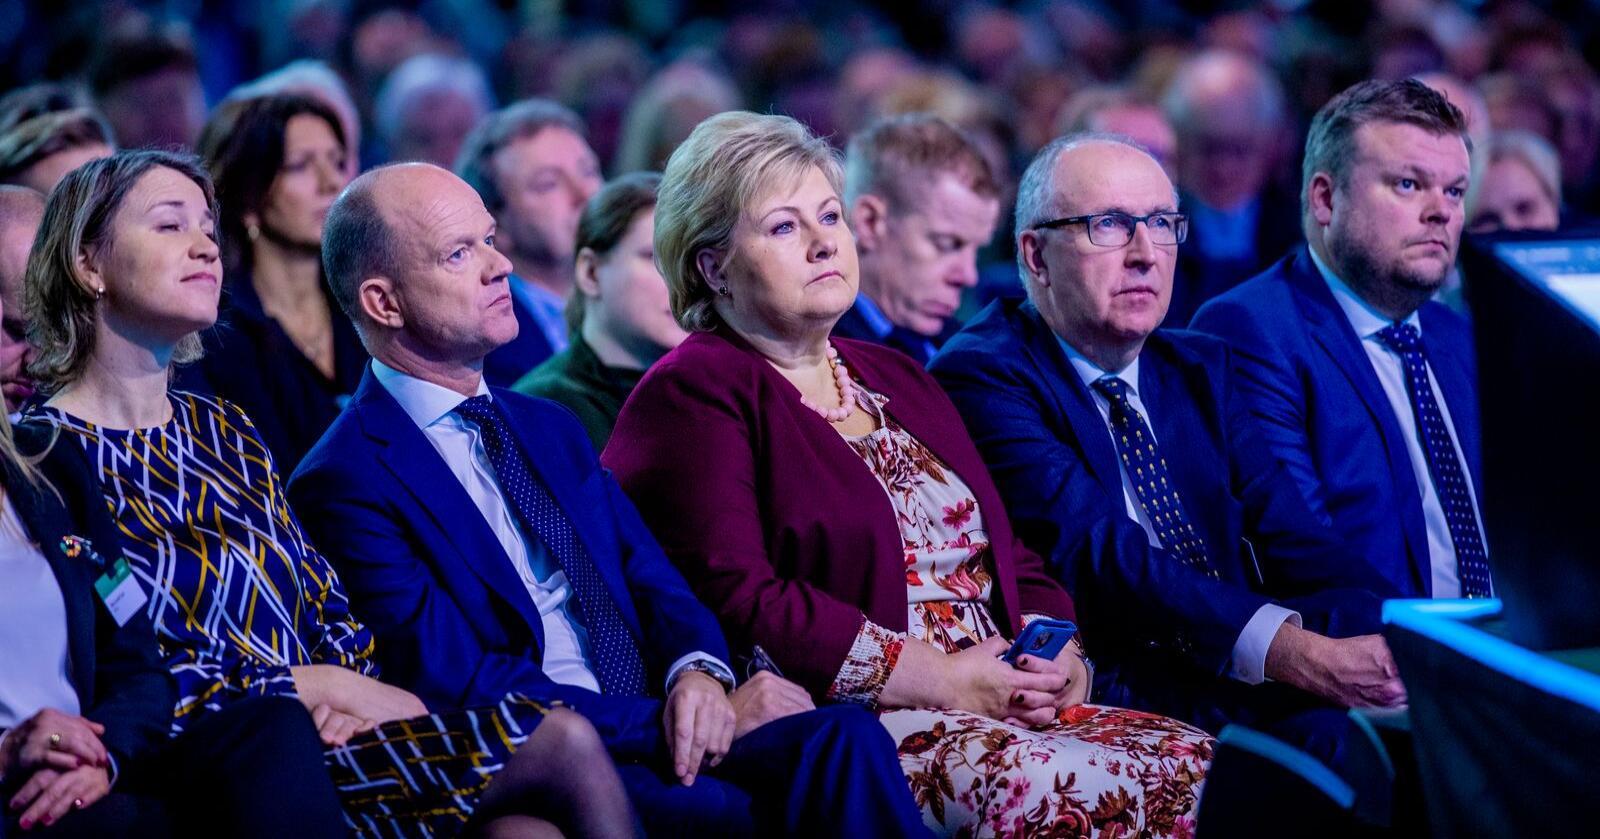 NHO-direktør Ole Erik Almlid, statsminister Erna Solberg og NHO-president Arvid Moss på NHOs årskonferanse i Oslo Spektrum. Foto: Stian Lysberg Solum / NTB scanpix